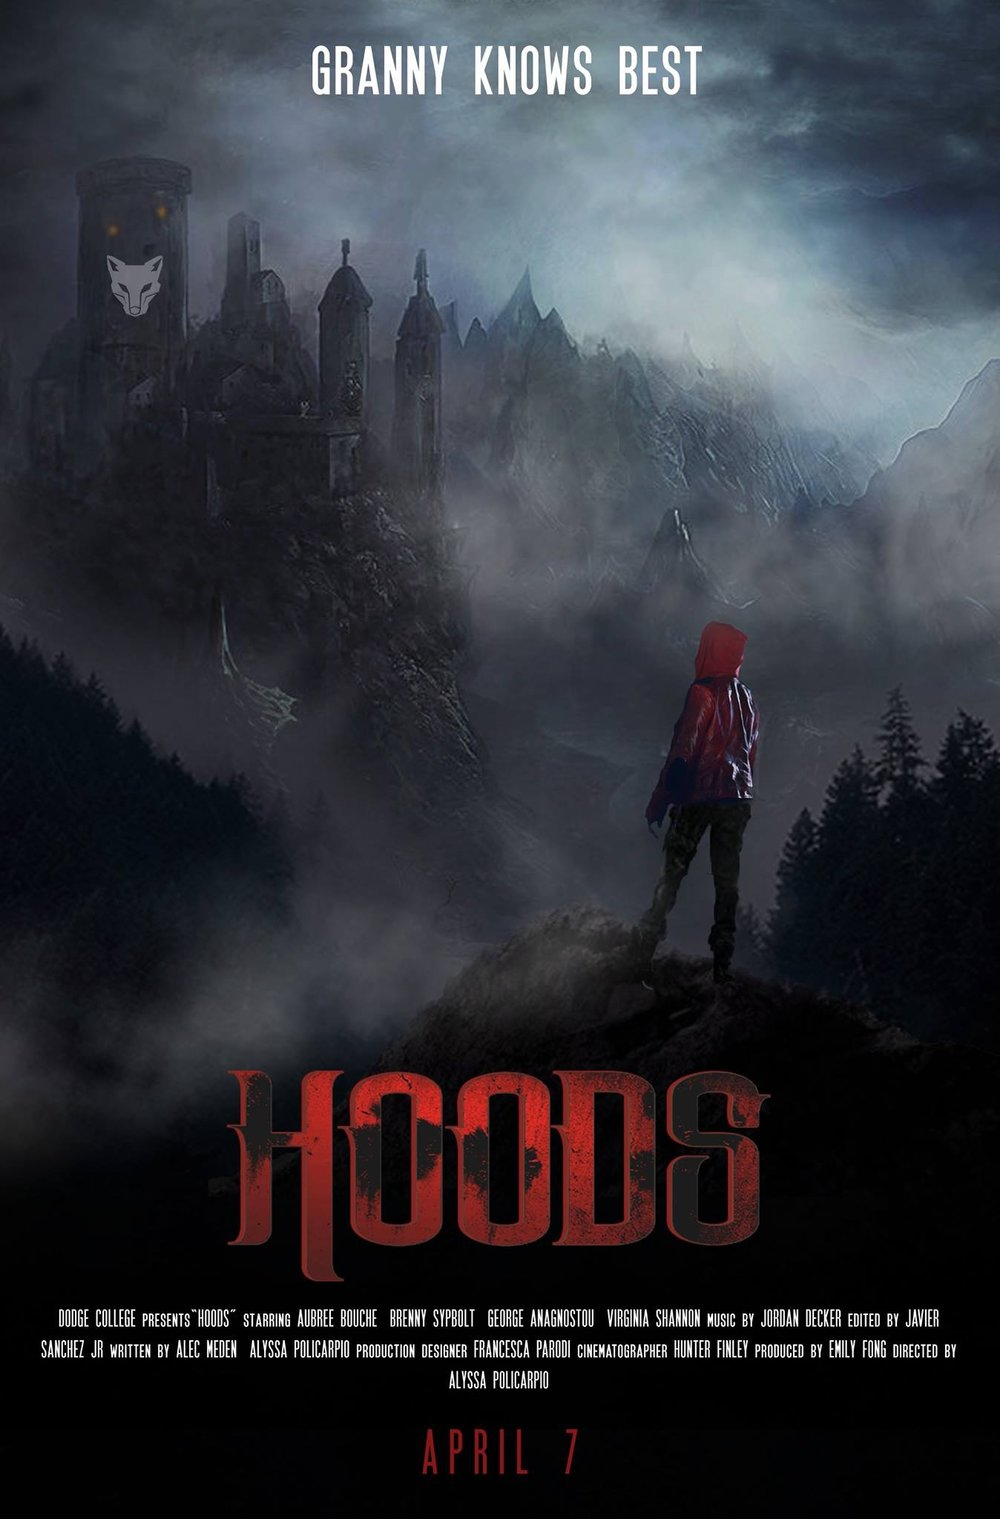 Poster for HOODS.